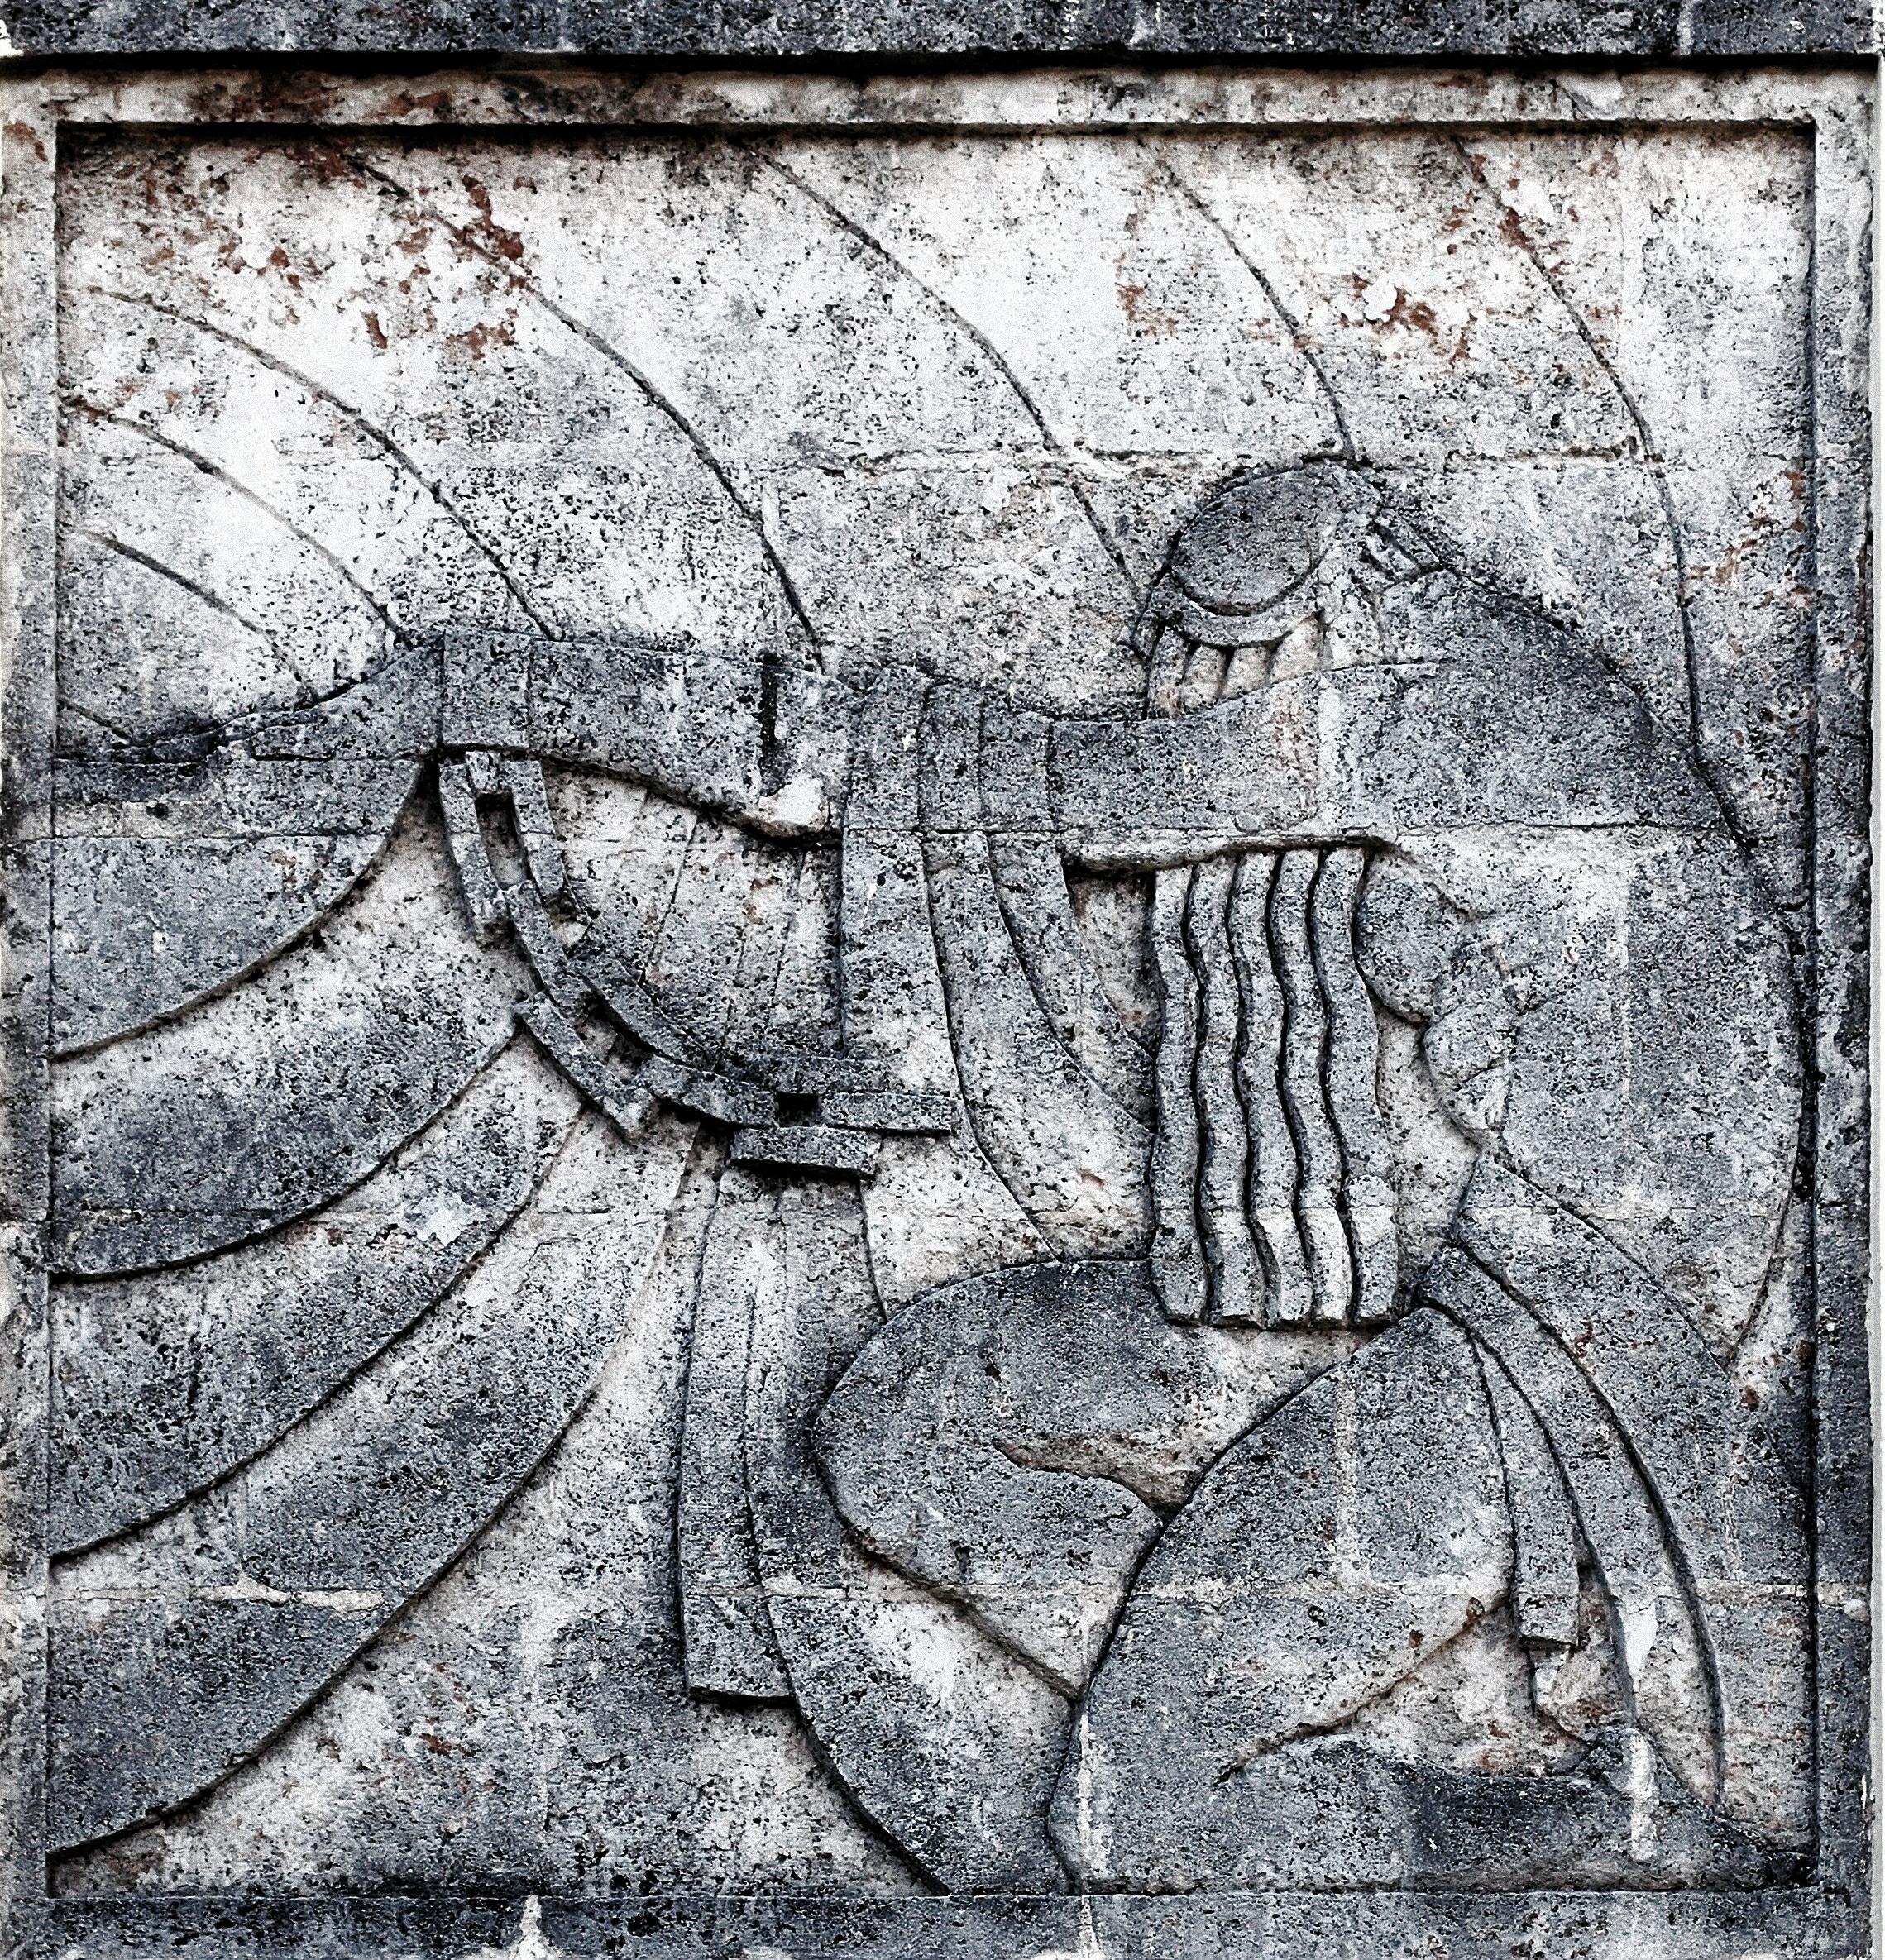 File:Art Deco Bas-relief, Havana (8614169669).jpg - Wikimedia Commons